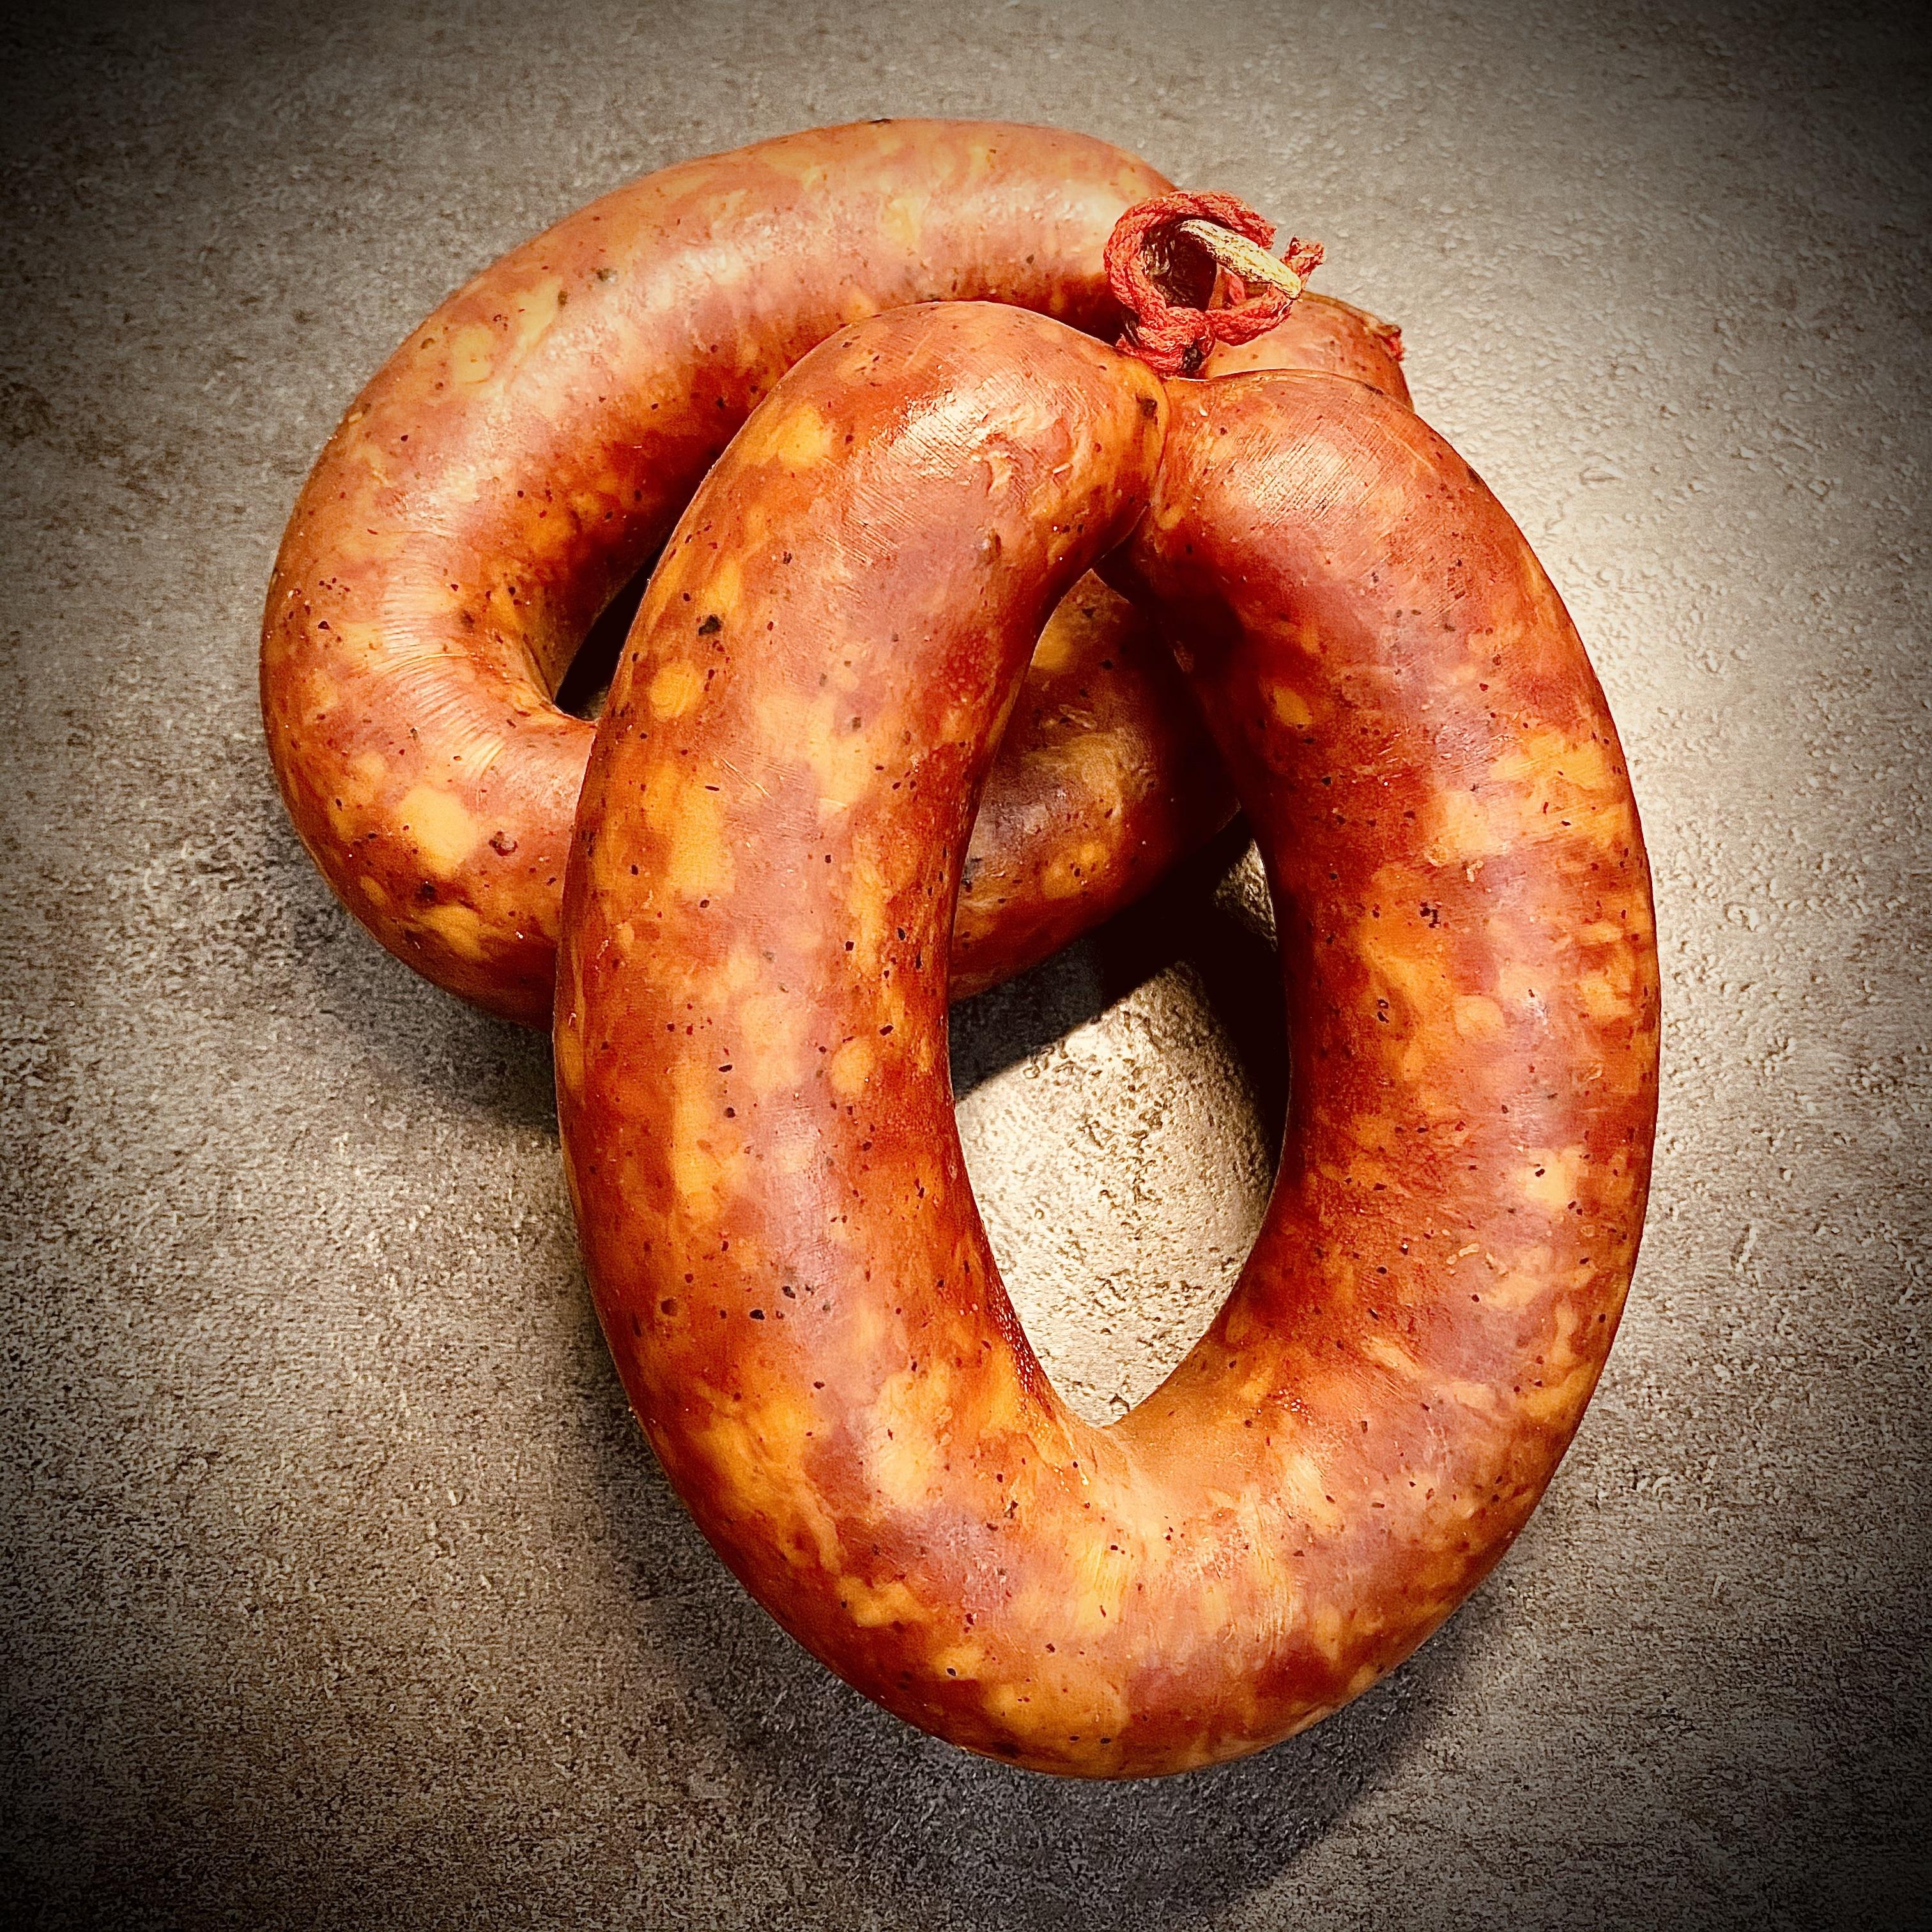 StrohGOLD Mettwurst-Ring / Bratwurst-Ring / Knackwurst, Knackwurst-Ring, Rohwurst